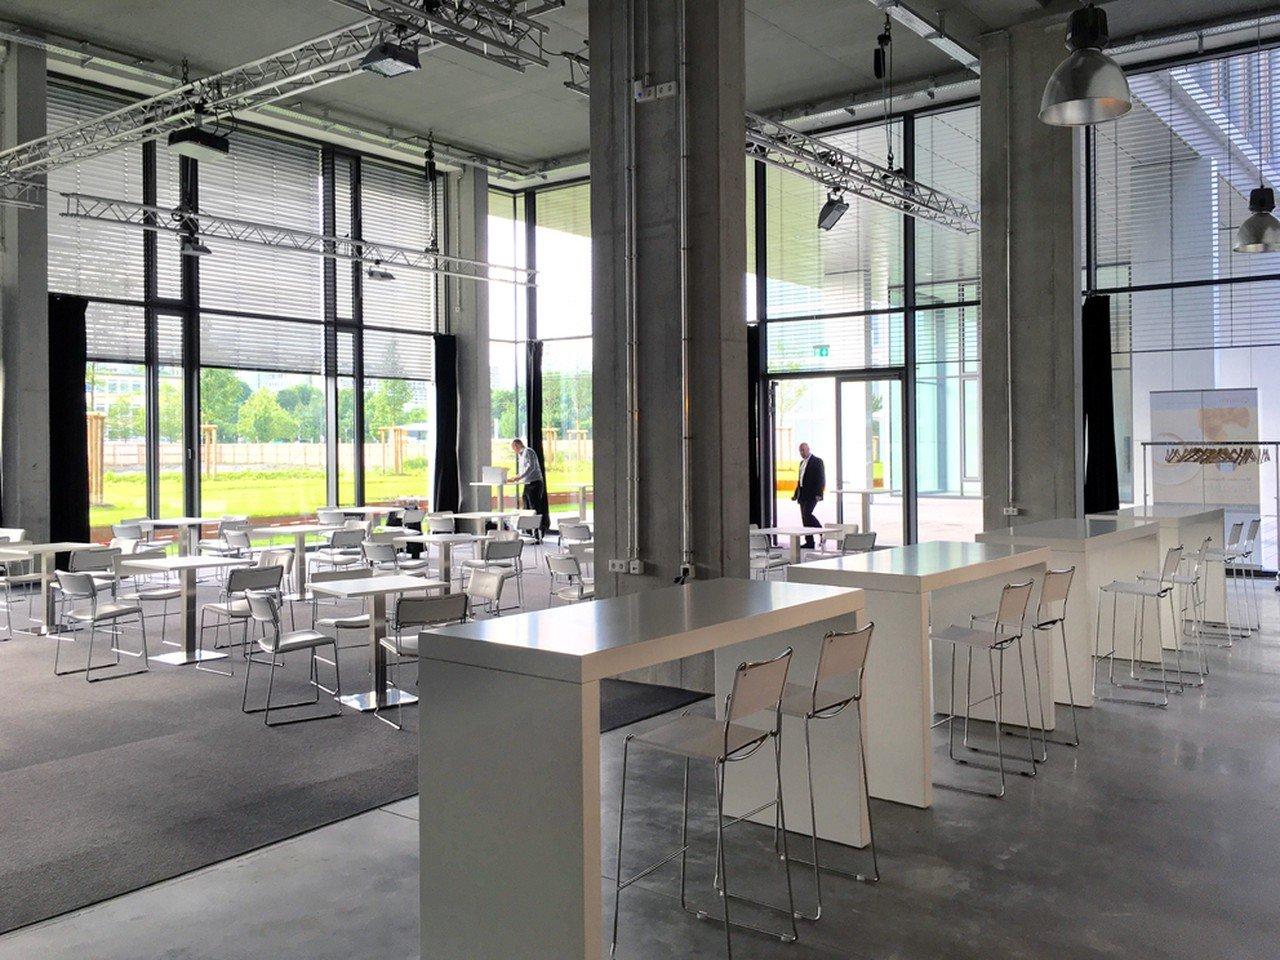 München corporate event venues Foto Studio Studio Balan image 0